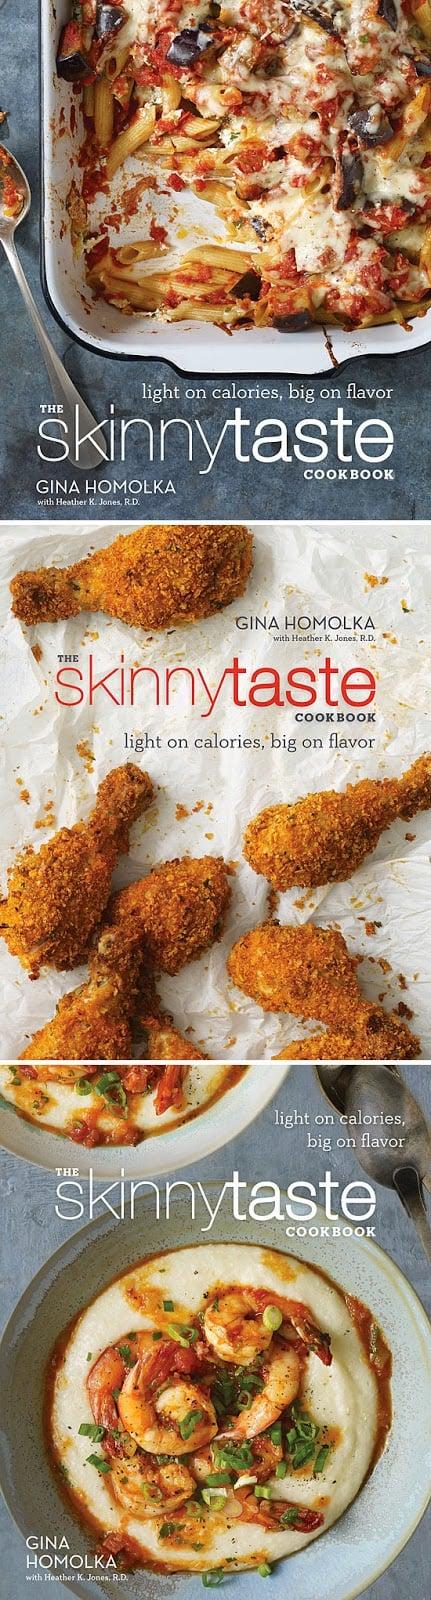 Skinnytaste Cookbook Cover Recipe ~ The skinnytaste cookbook cover designs help me choose